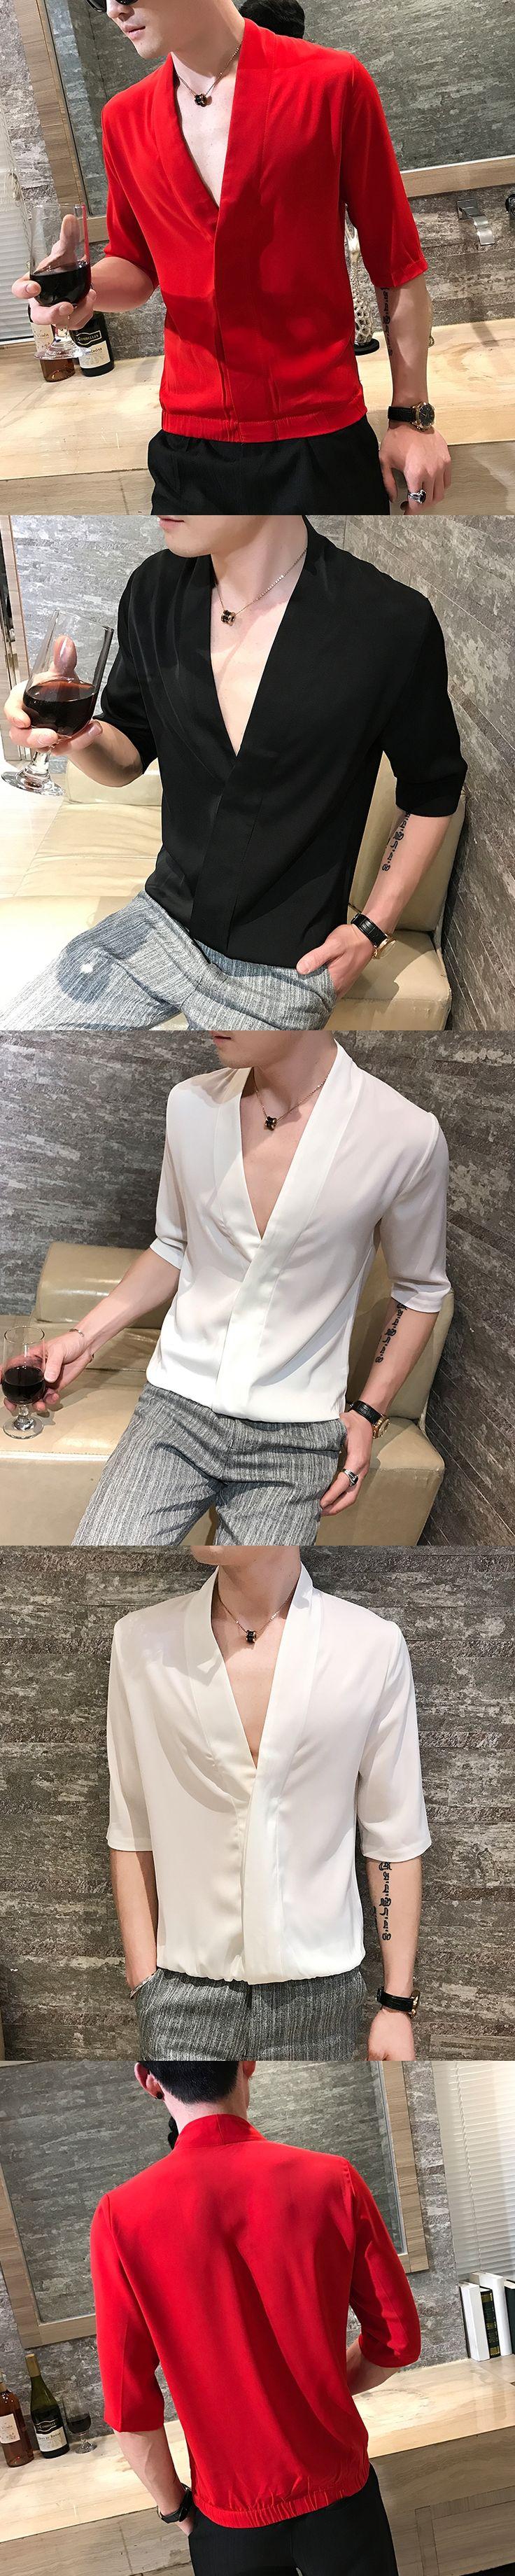 Deep V-Neck T shirts Mens Red T shirts Black Sexy Club Outfits Camisa Social Masculina Casual Mens t shirts fashion 2017 White